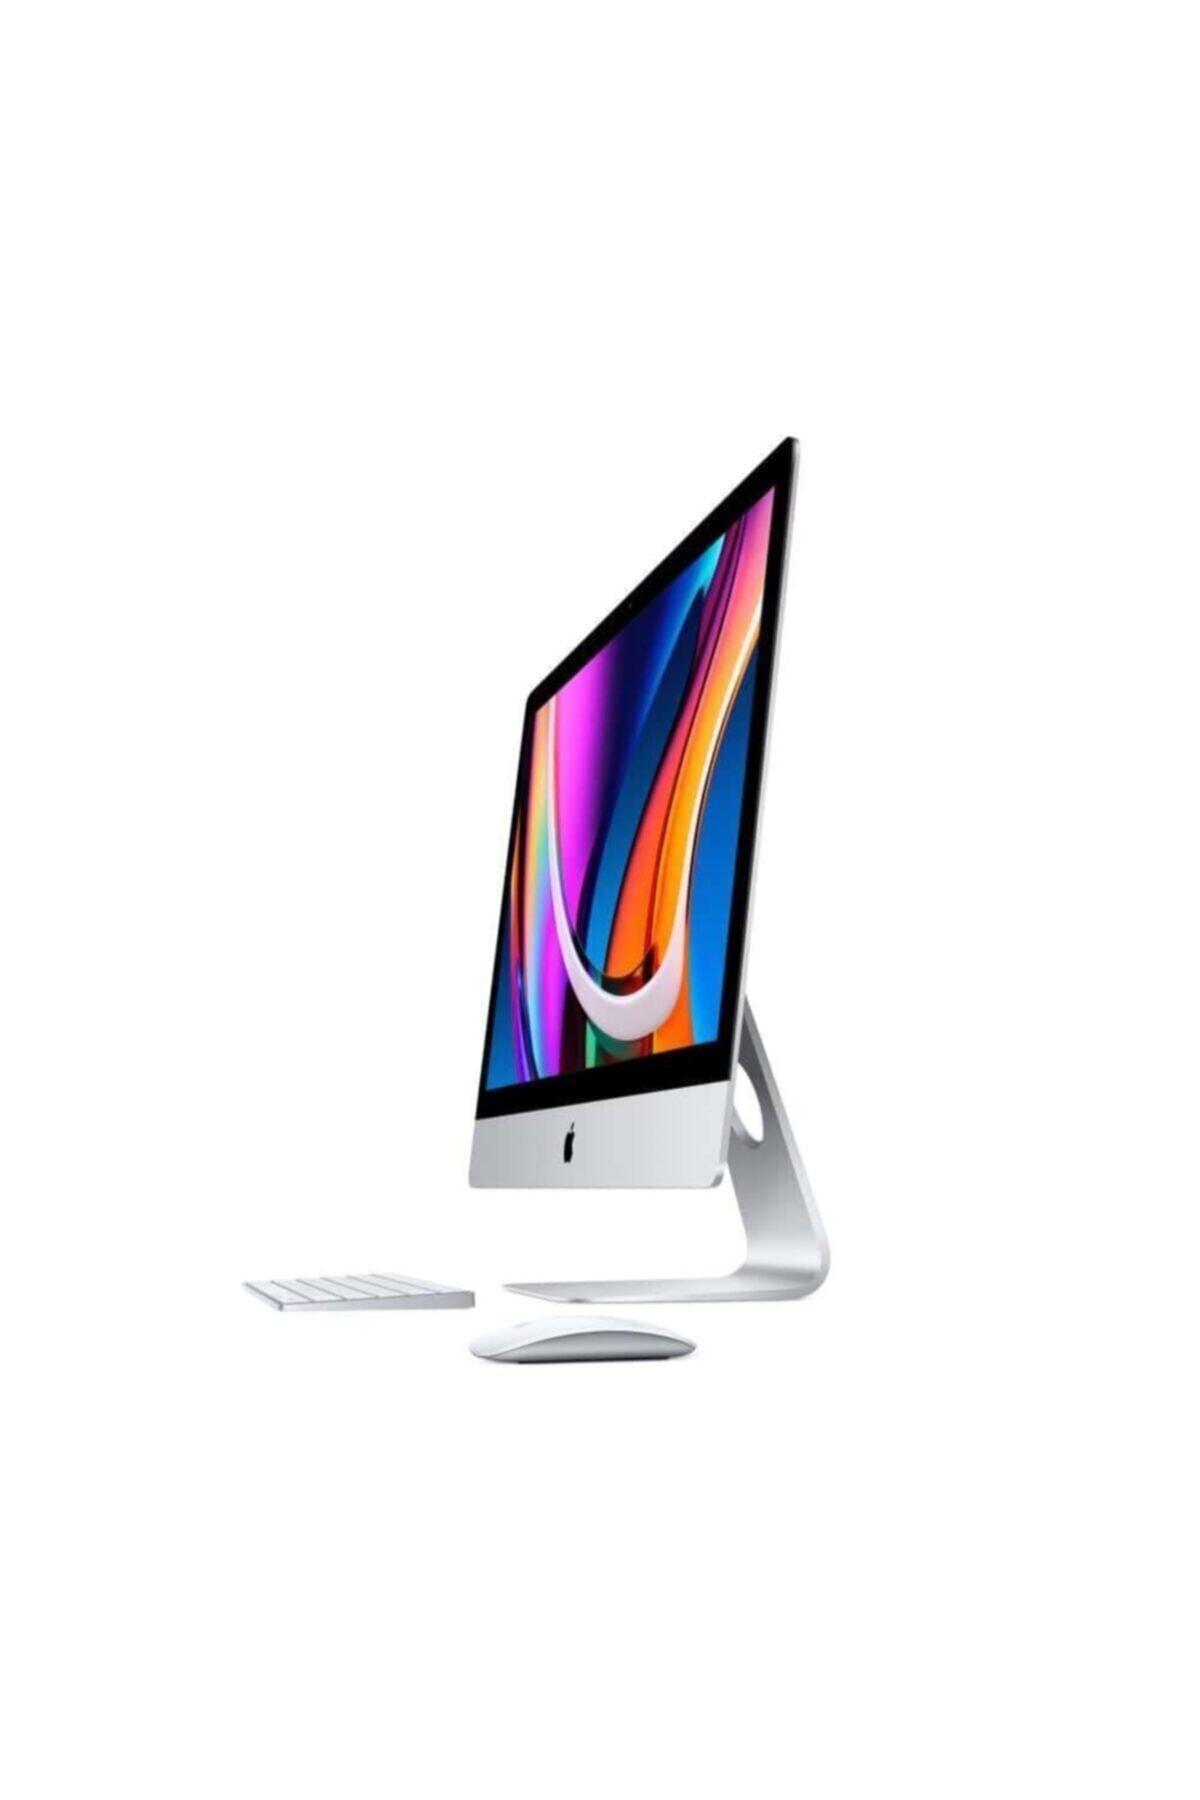 "Apple iMac Intel Core i5 8GB 512GB SSD macOS Catalina 27"" FHD All-in-One Bilgisayar MXWU2TU/A 2"